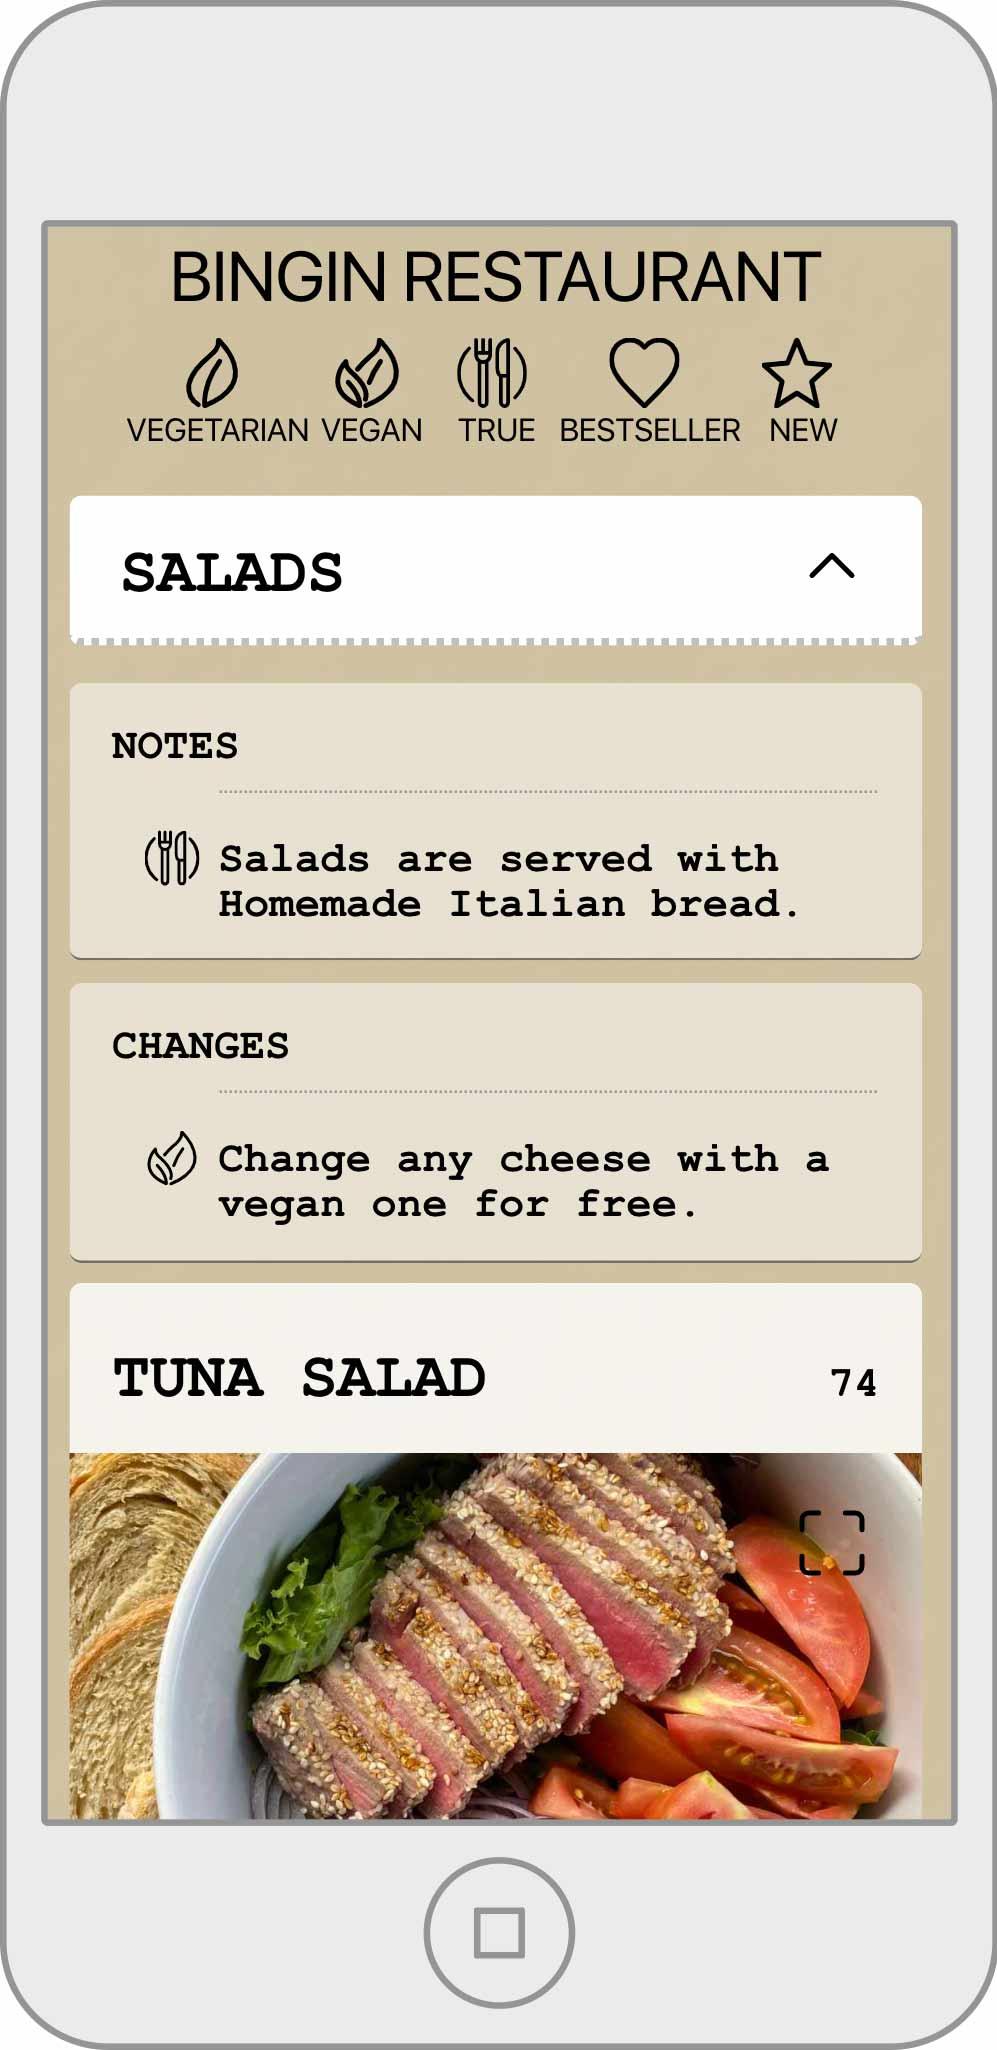 Casa Asia Bingin Restaurant visual menu